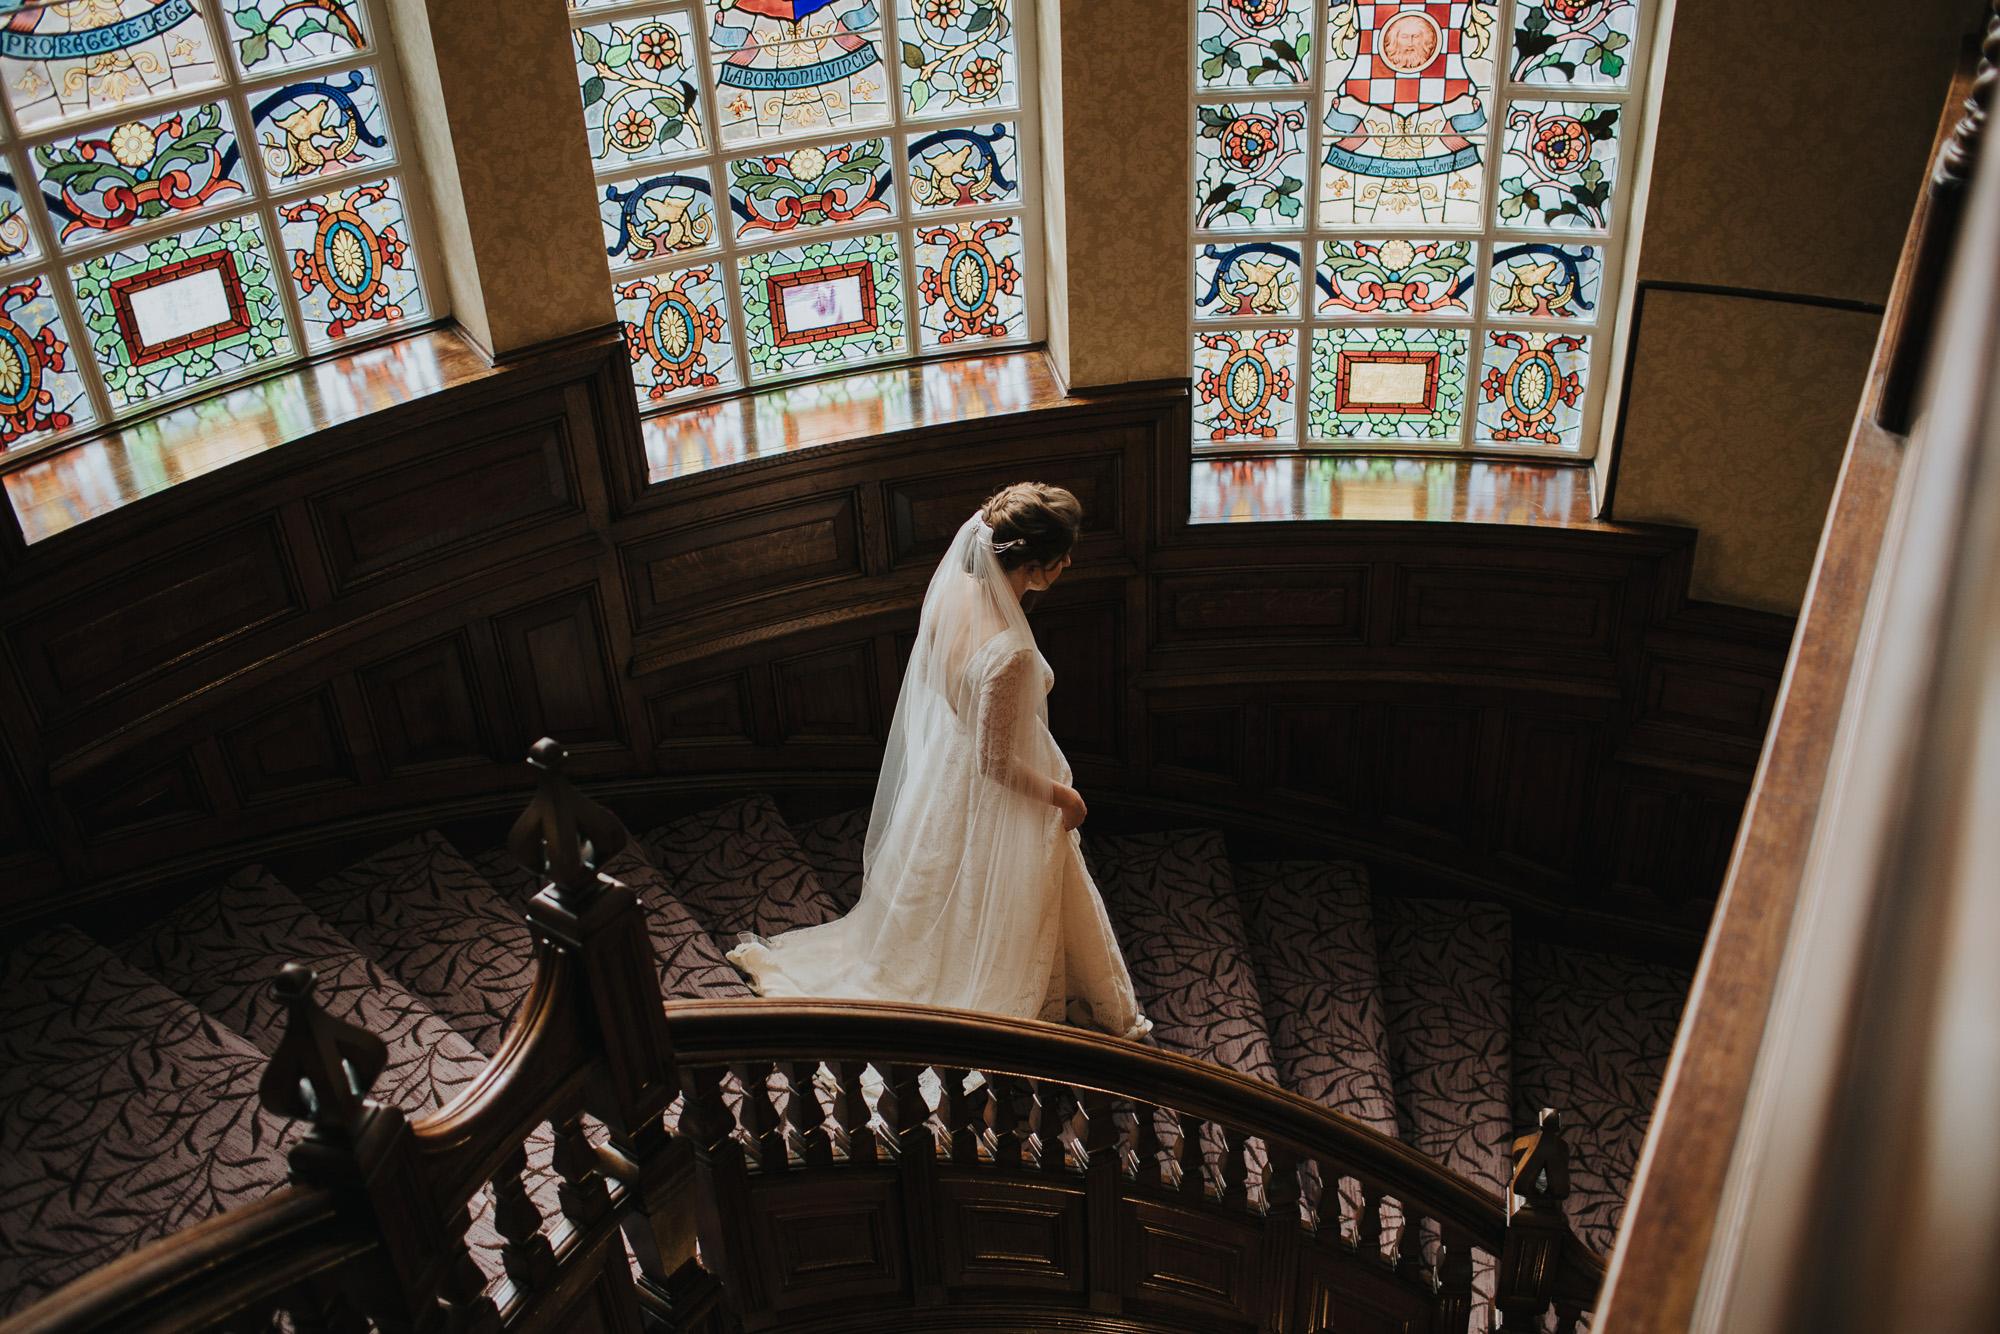 Kate-Beaumont-Lace-Flared-Dahlia-Gown-Leeds-Wedding-Bloom-Weddings-11.jpg